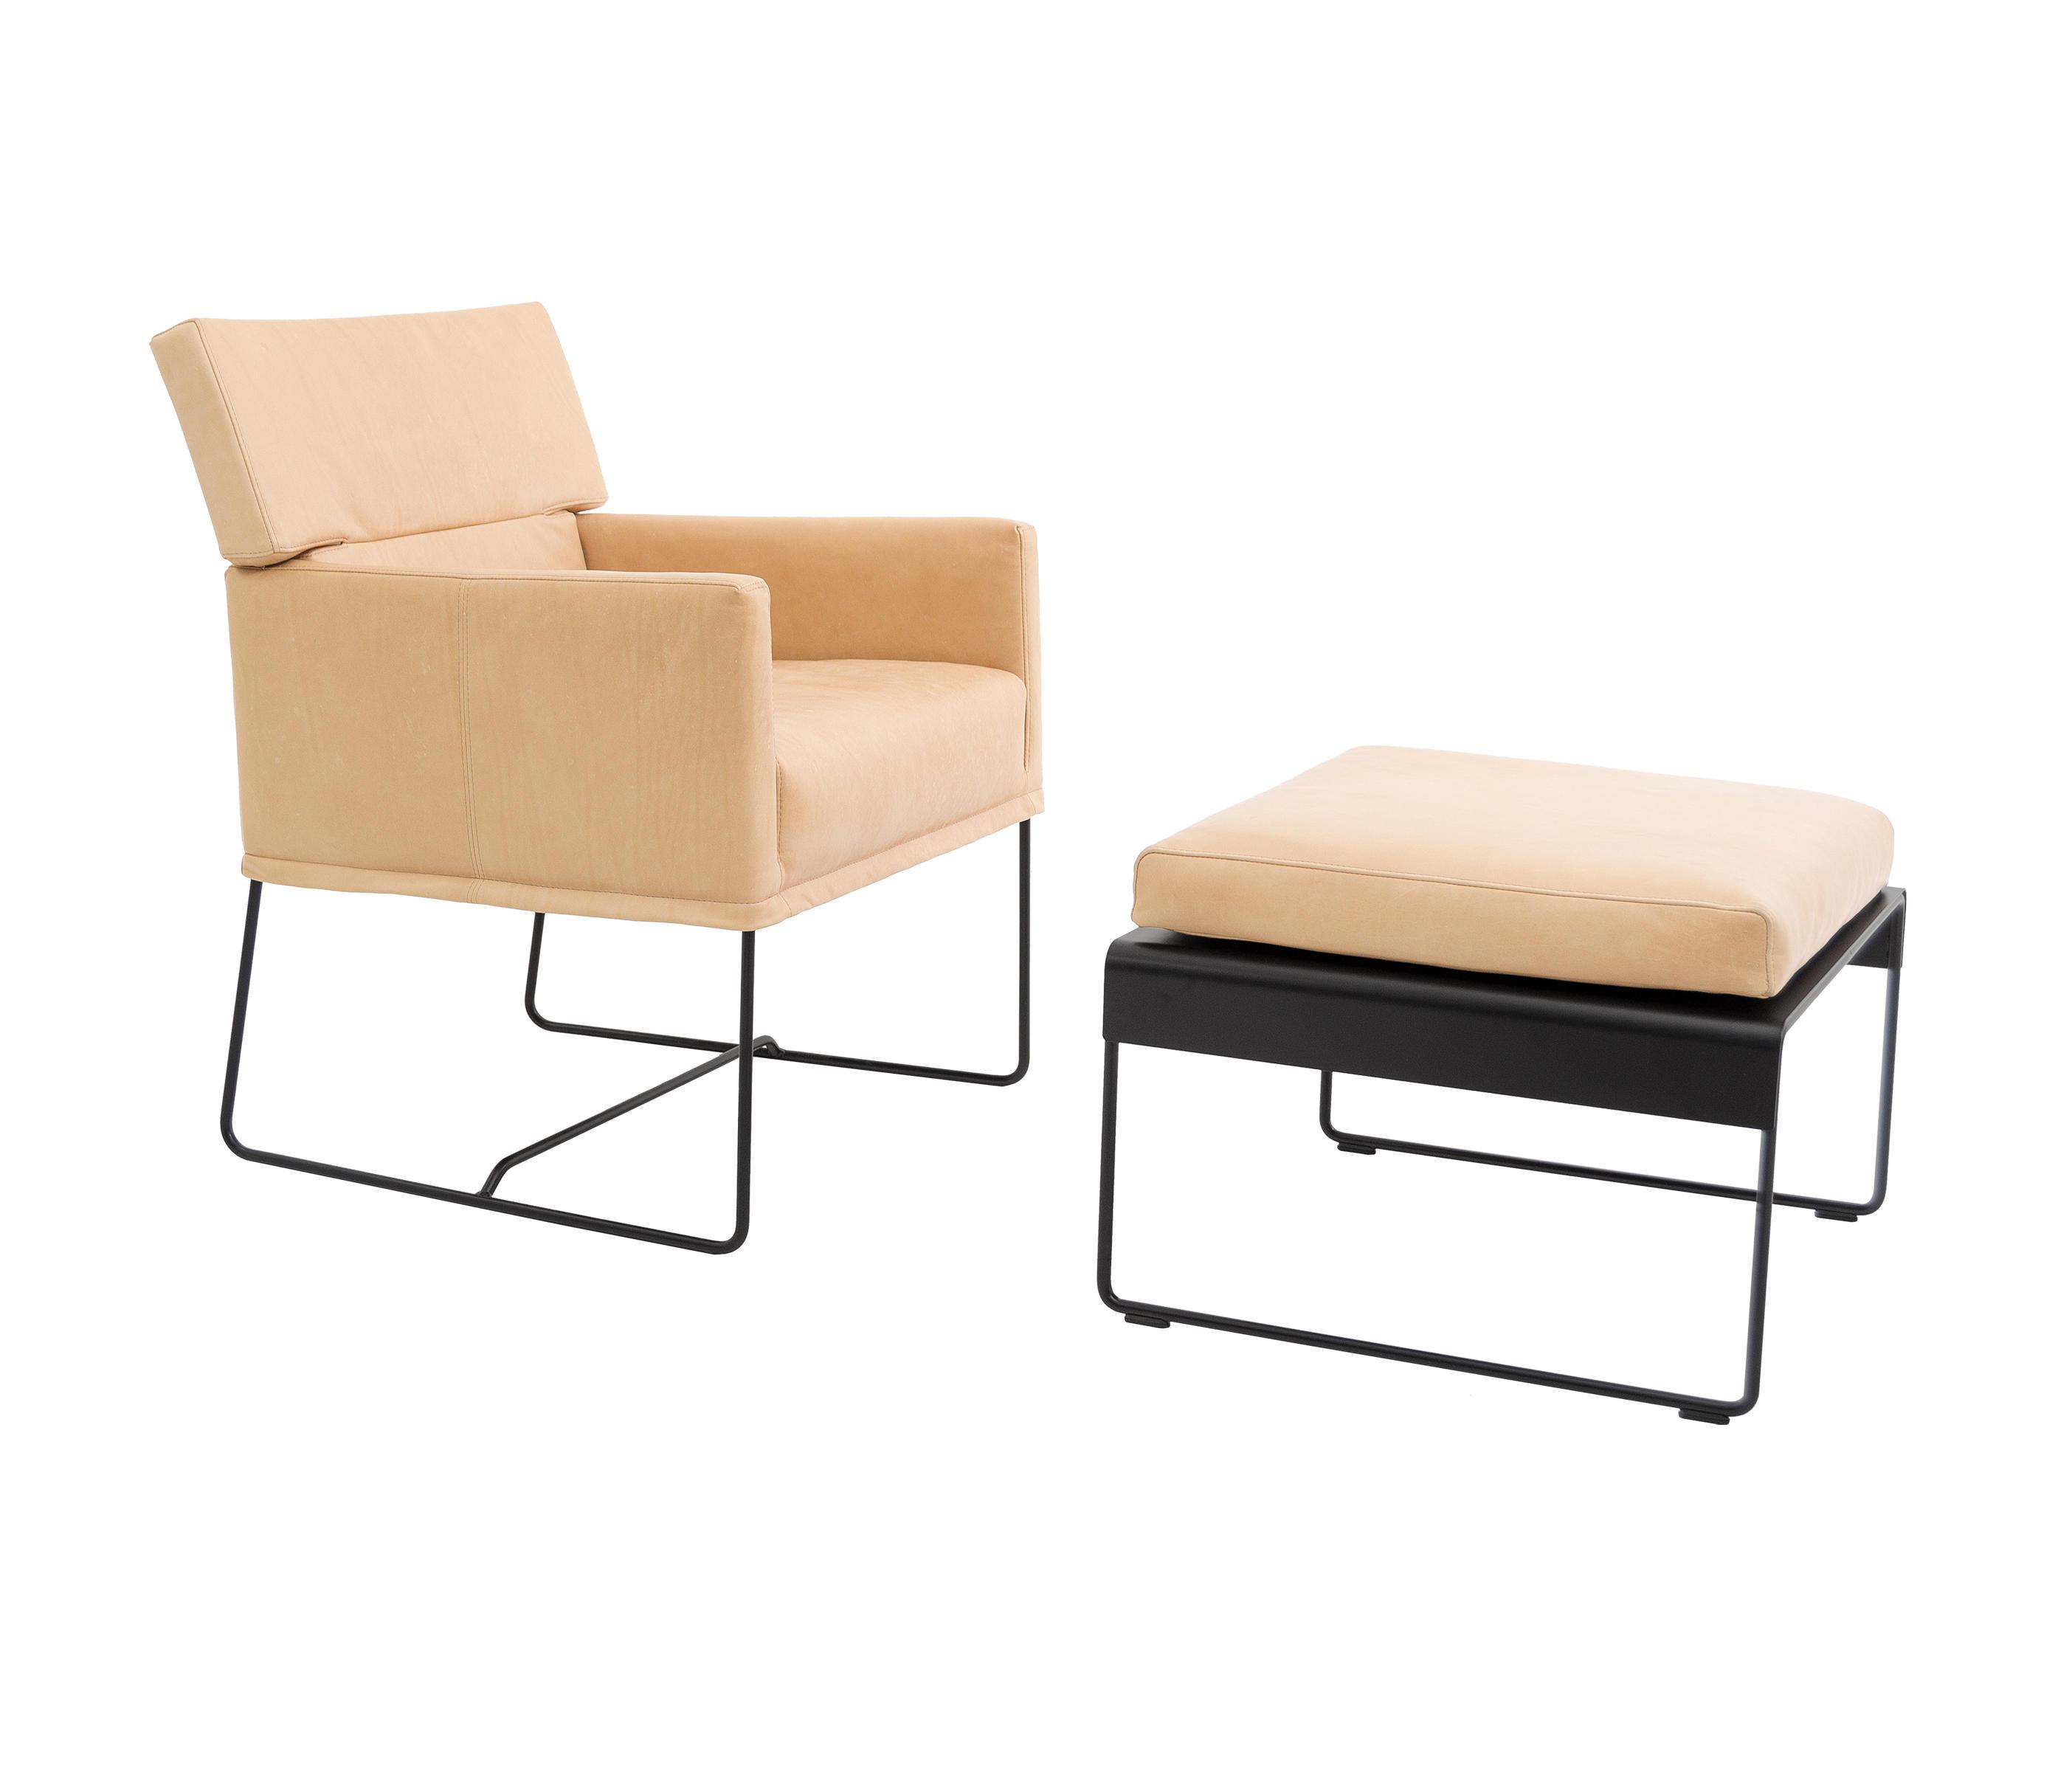 caal lounge fauteuils d 39 attente de kff architonic. Black Bedroom Furniture Sets. Home Design Ideas